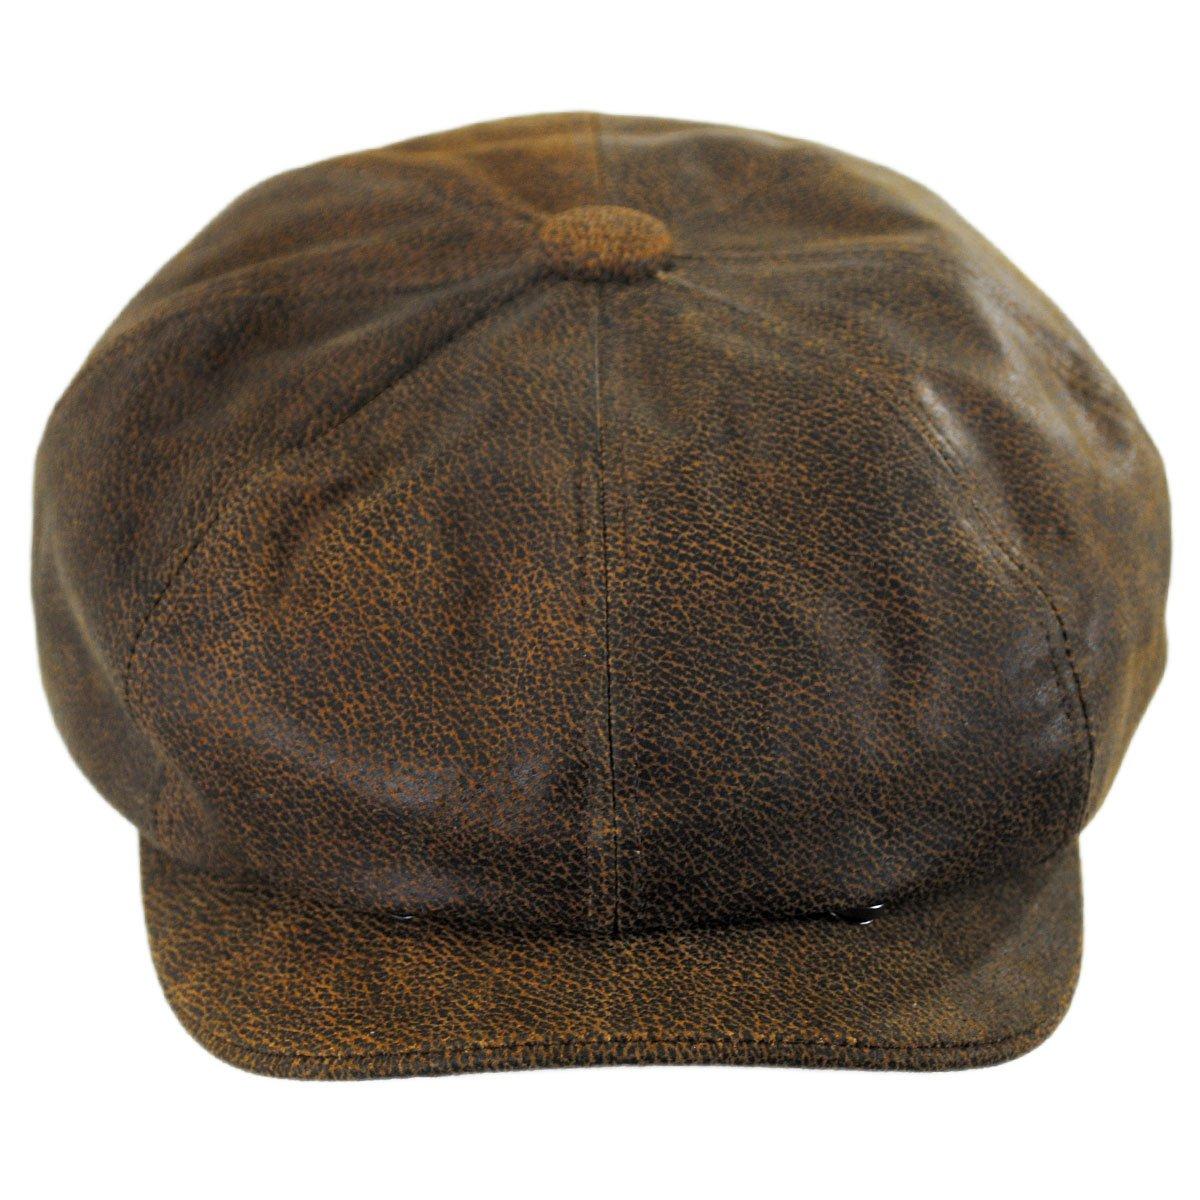 e1e15bd13 Jaxon Hats Leather Newsboy Cap at Amazon Men's Clothing store: